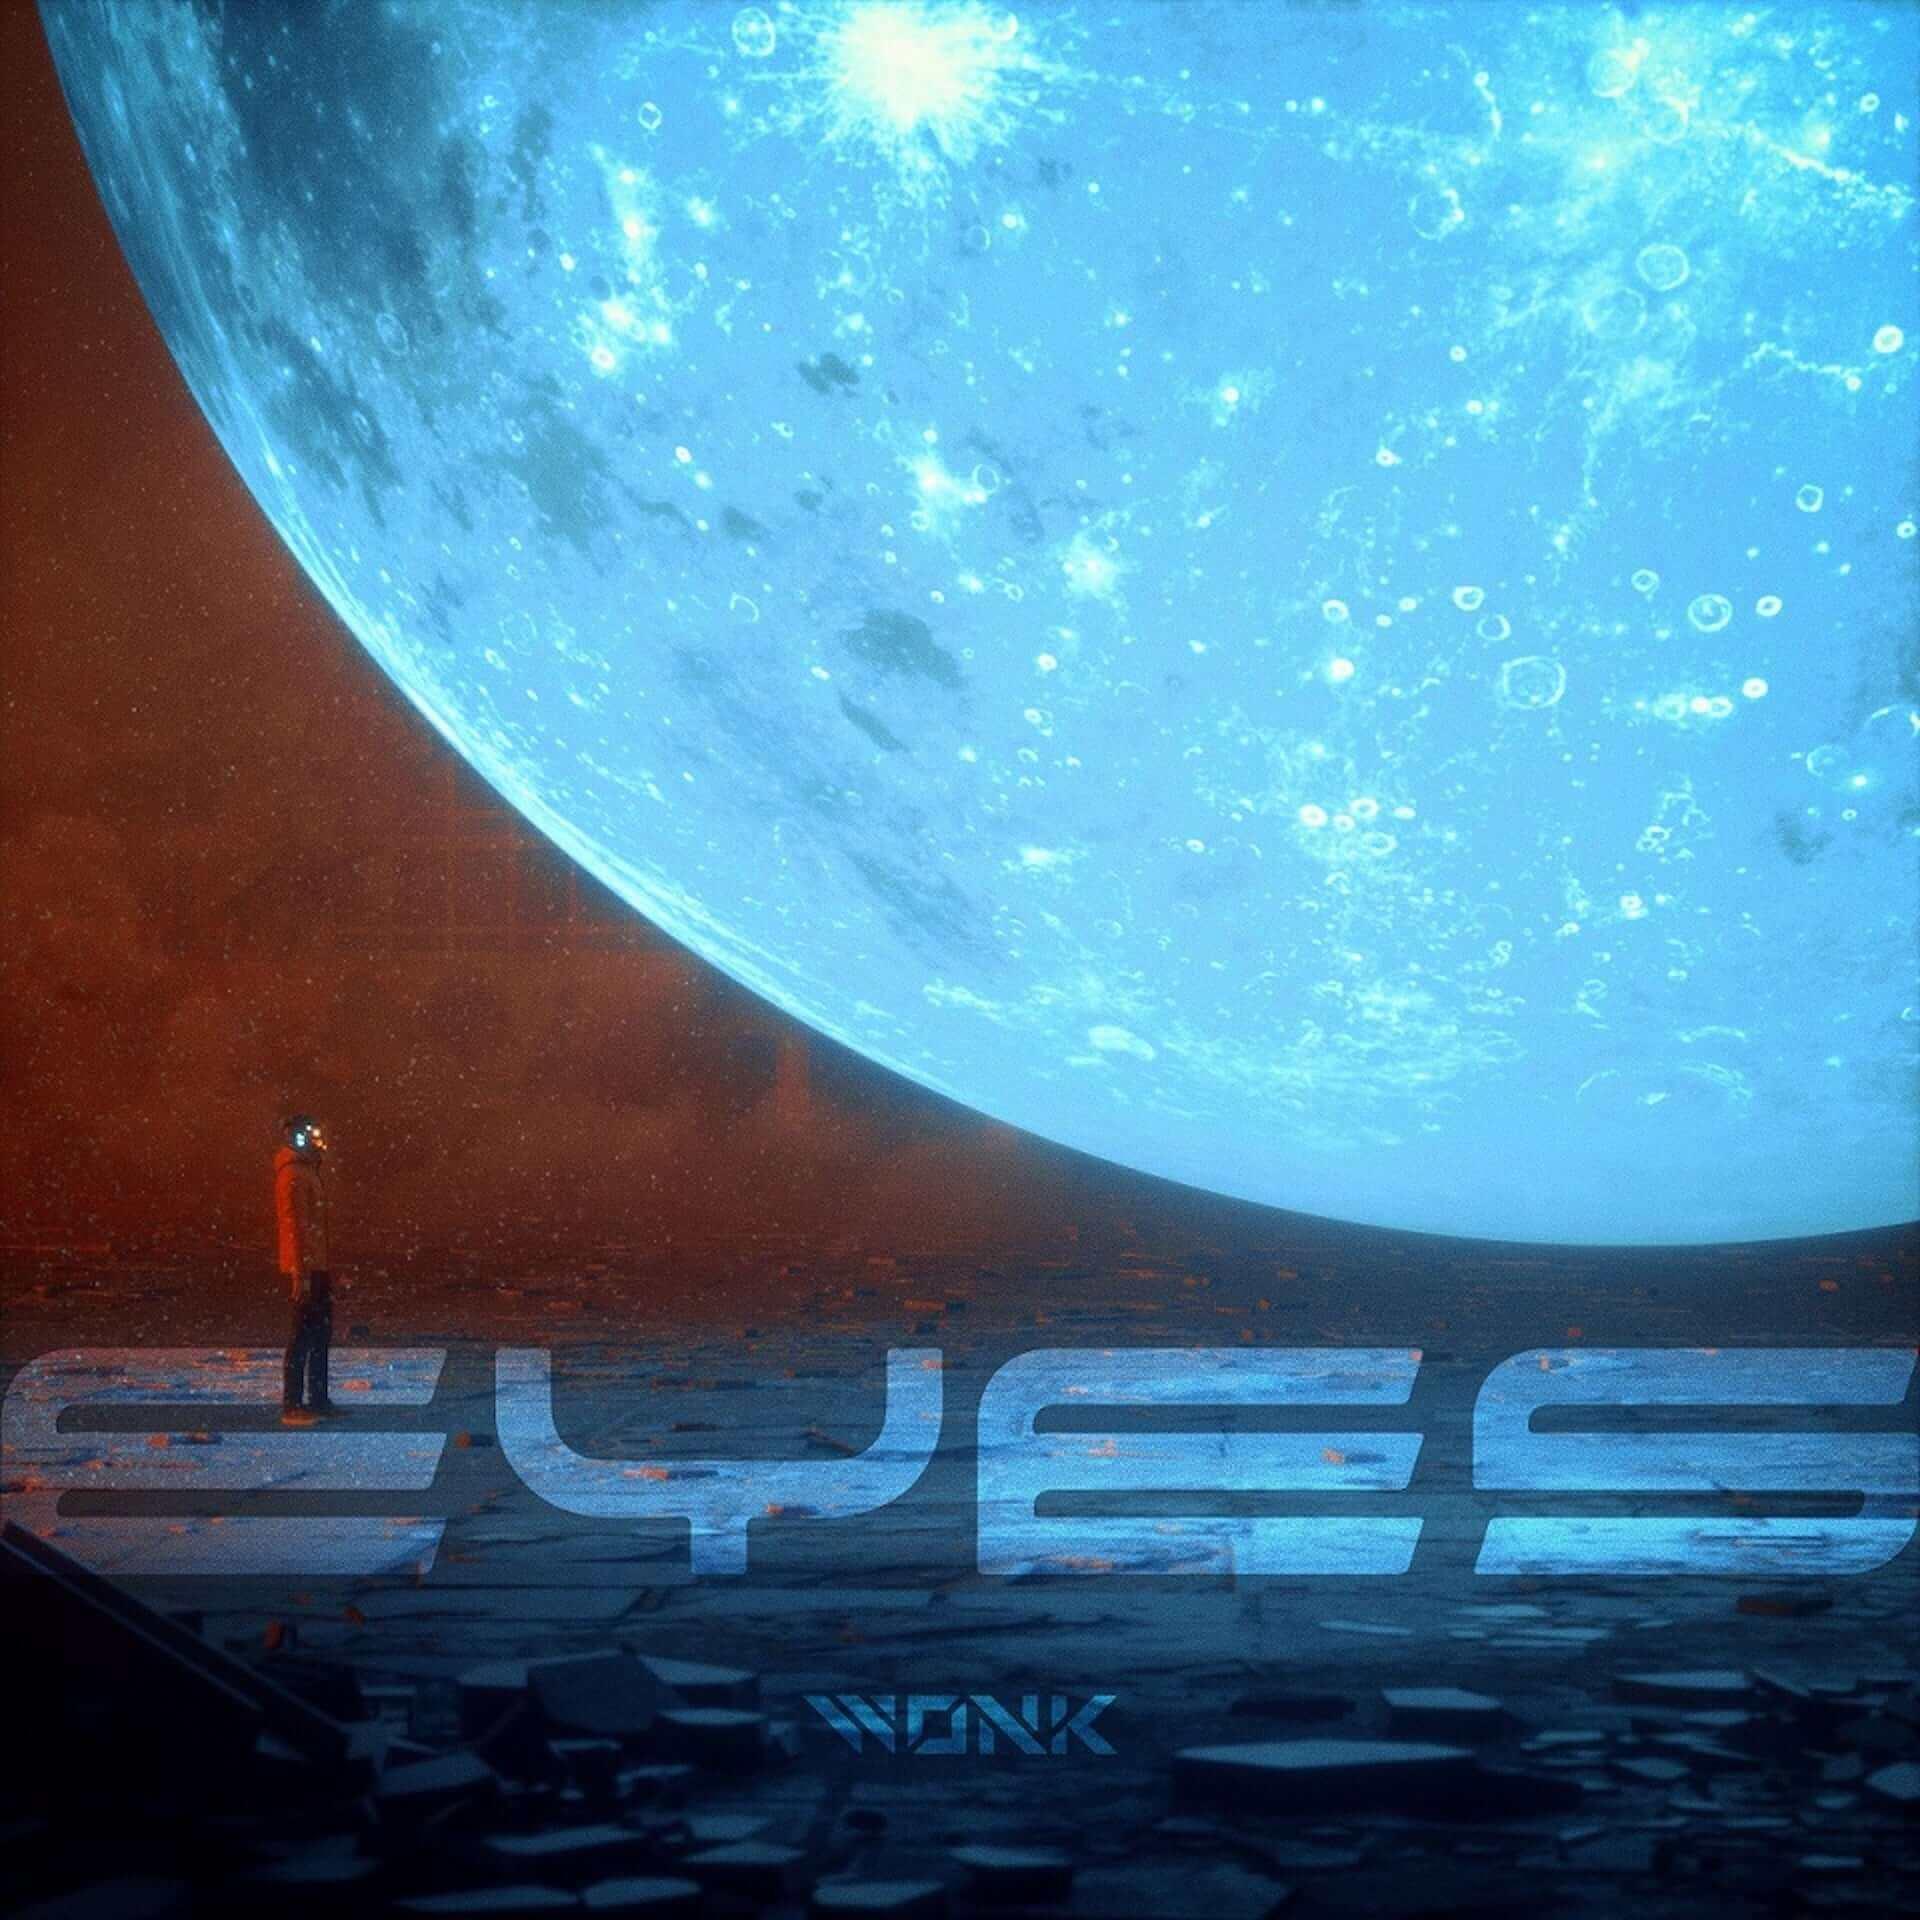 WONK配信ライブ<EYES SPECIAL 3DCG LIVE>のBlu-rayジャケットが公開!ライブ音源配信の事前登録もスタート music201015_wonk_1-1920x1920